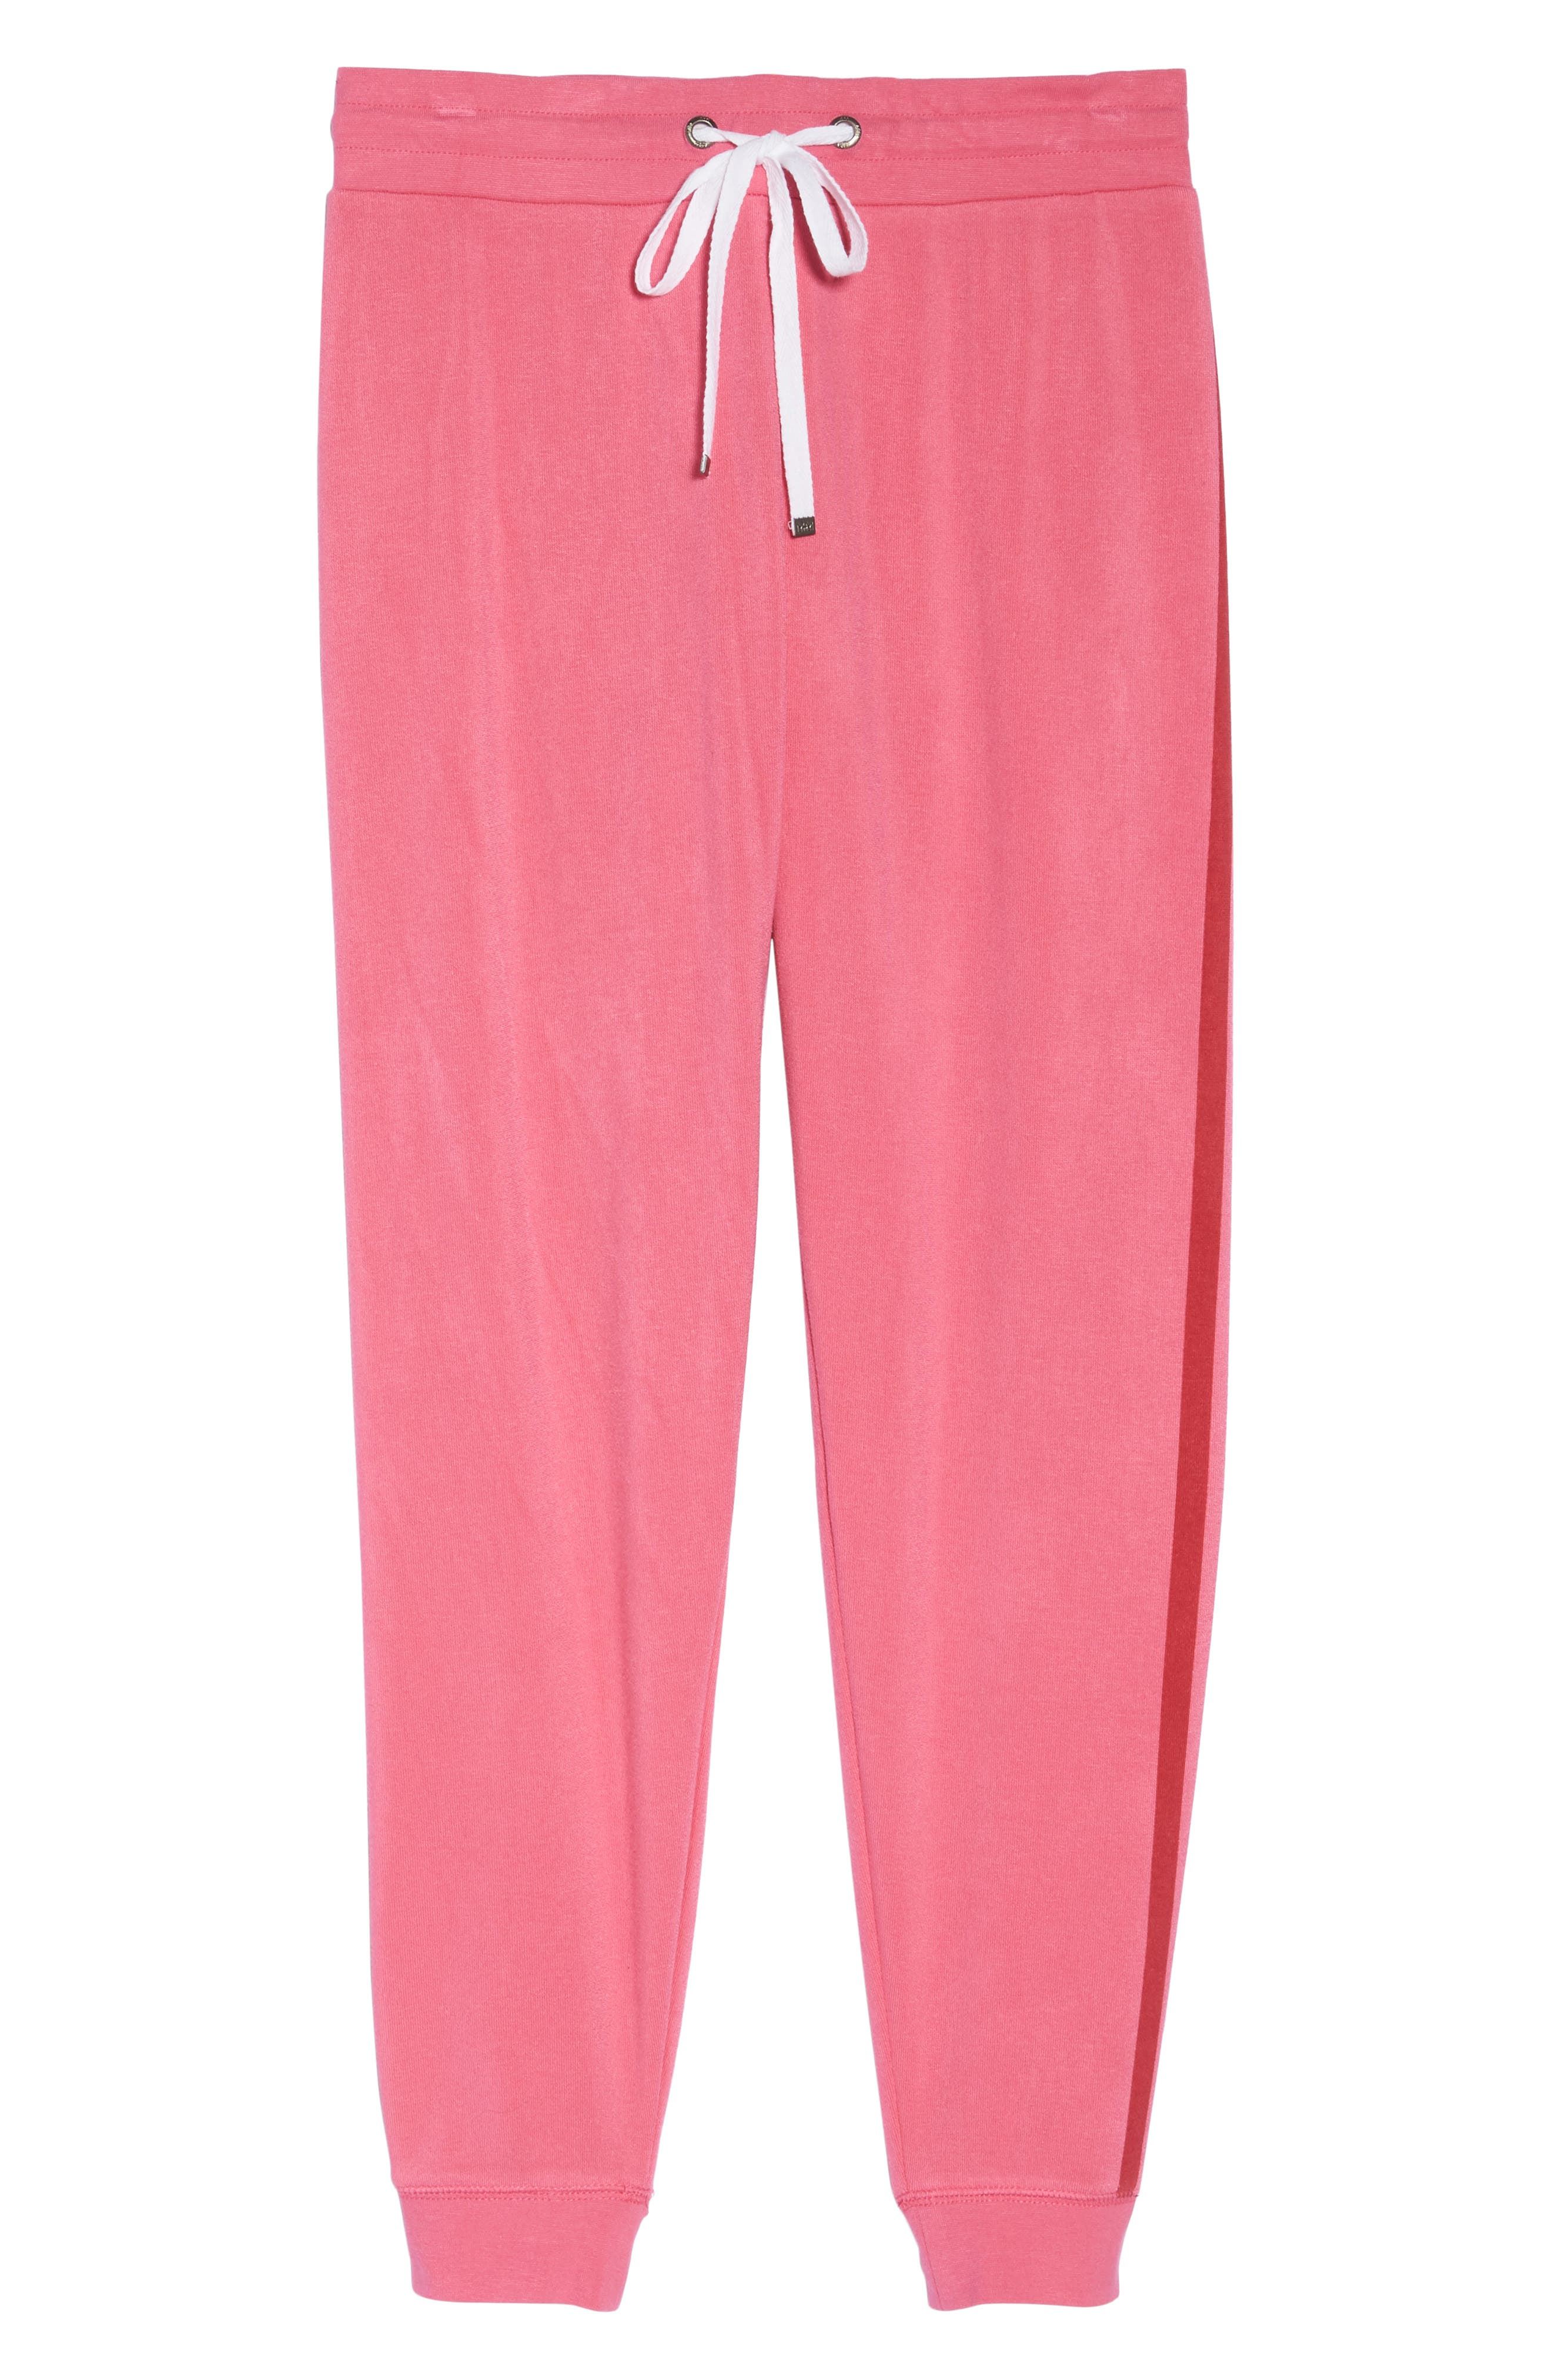 Firecracker Jogger Pajama Pants,                             Alternate thumbnail 5, color,                             Pink Fandango